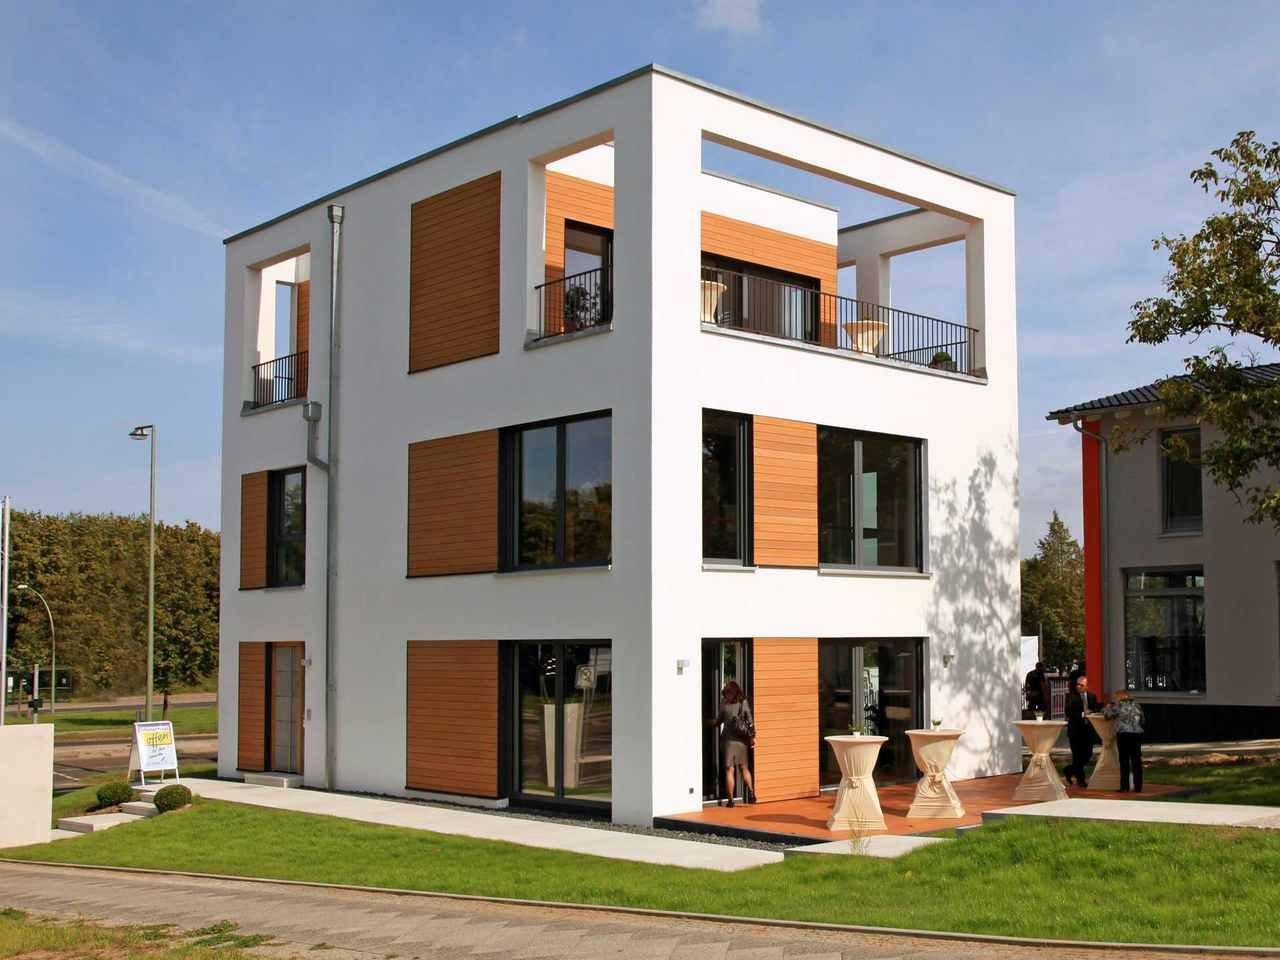 Bauhausvilla BH 205 Lechner Massivhaus Massivhaus